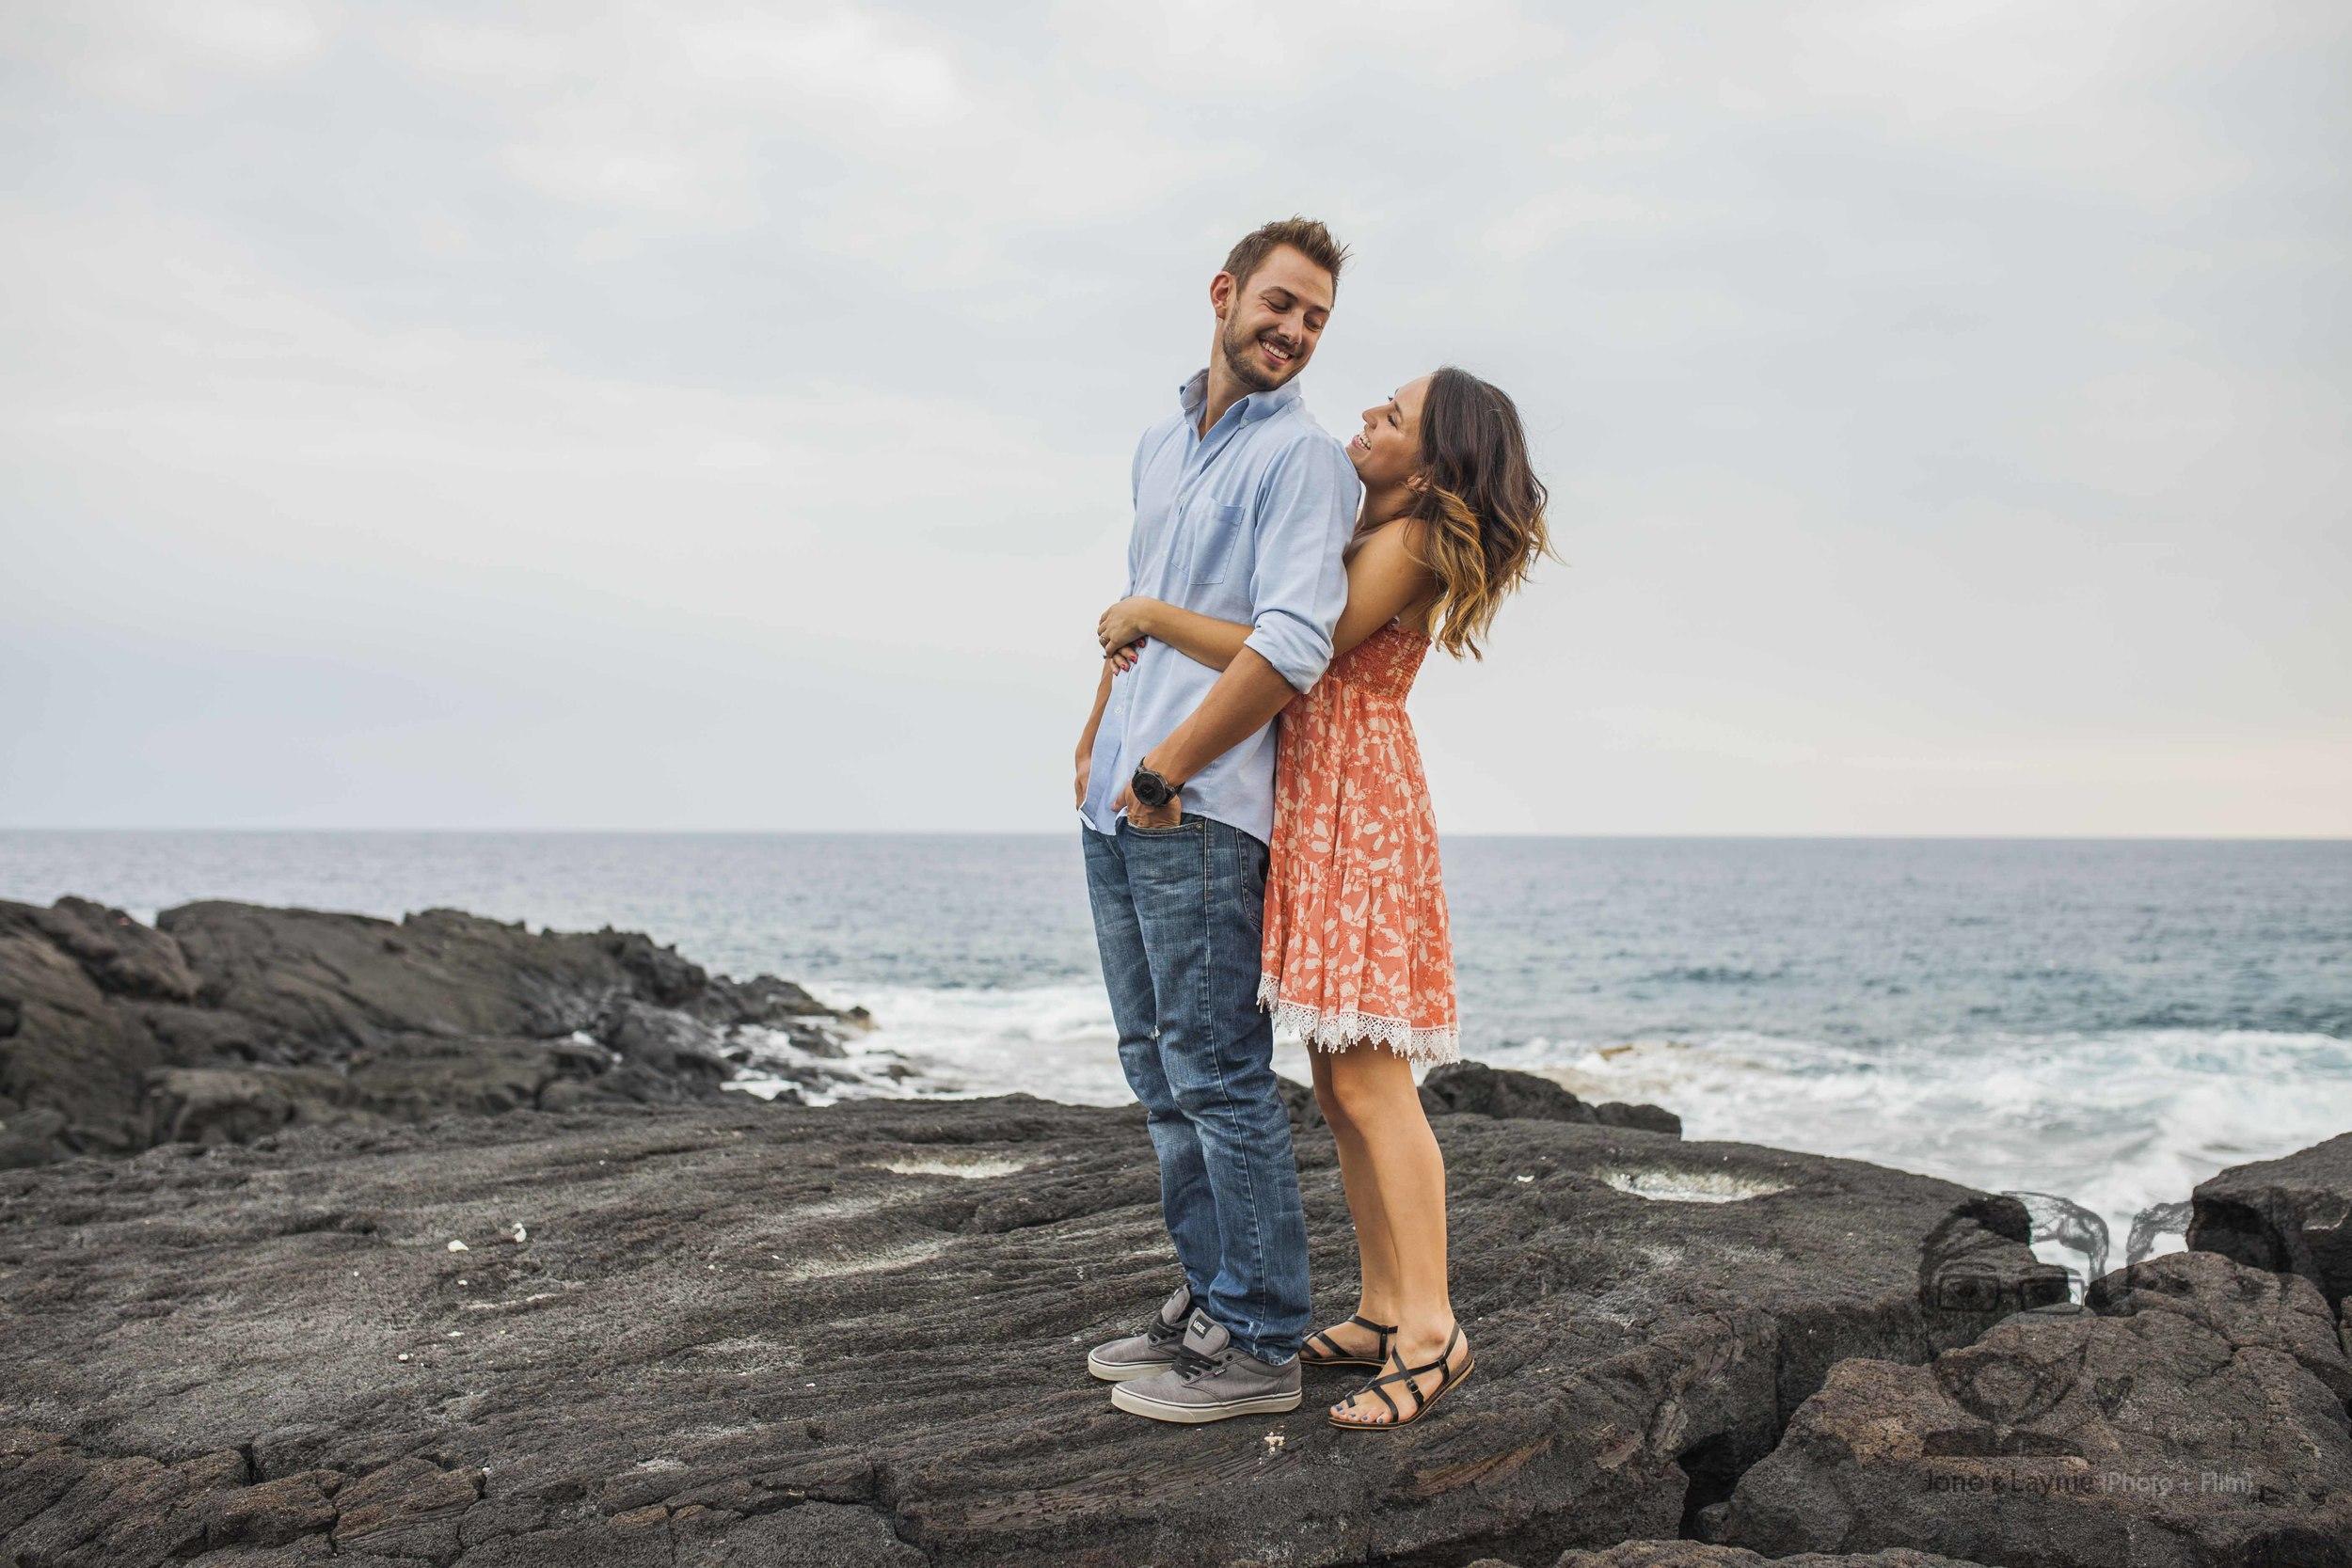 Jono & Laynie Co.-Kona, Hawaii-Engagement Session11.jpg